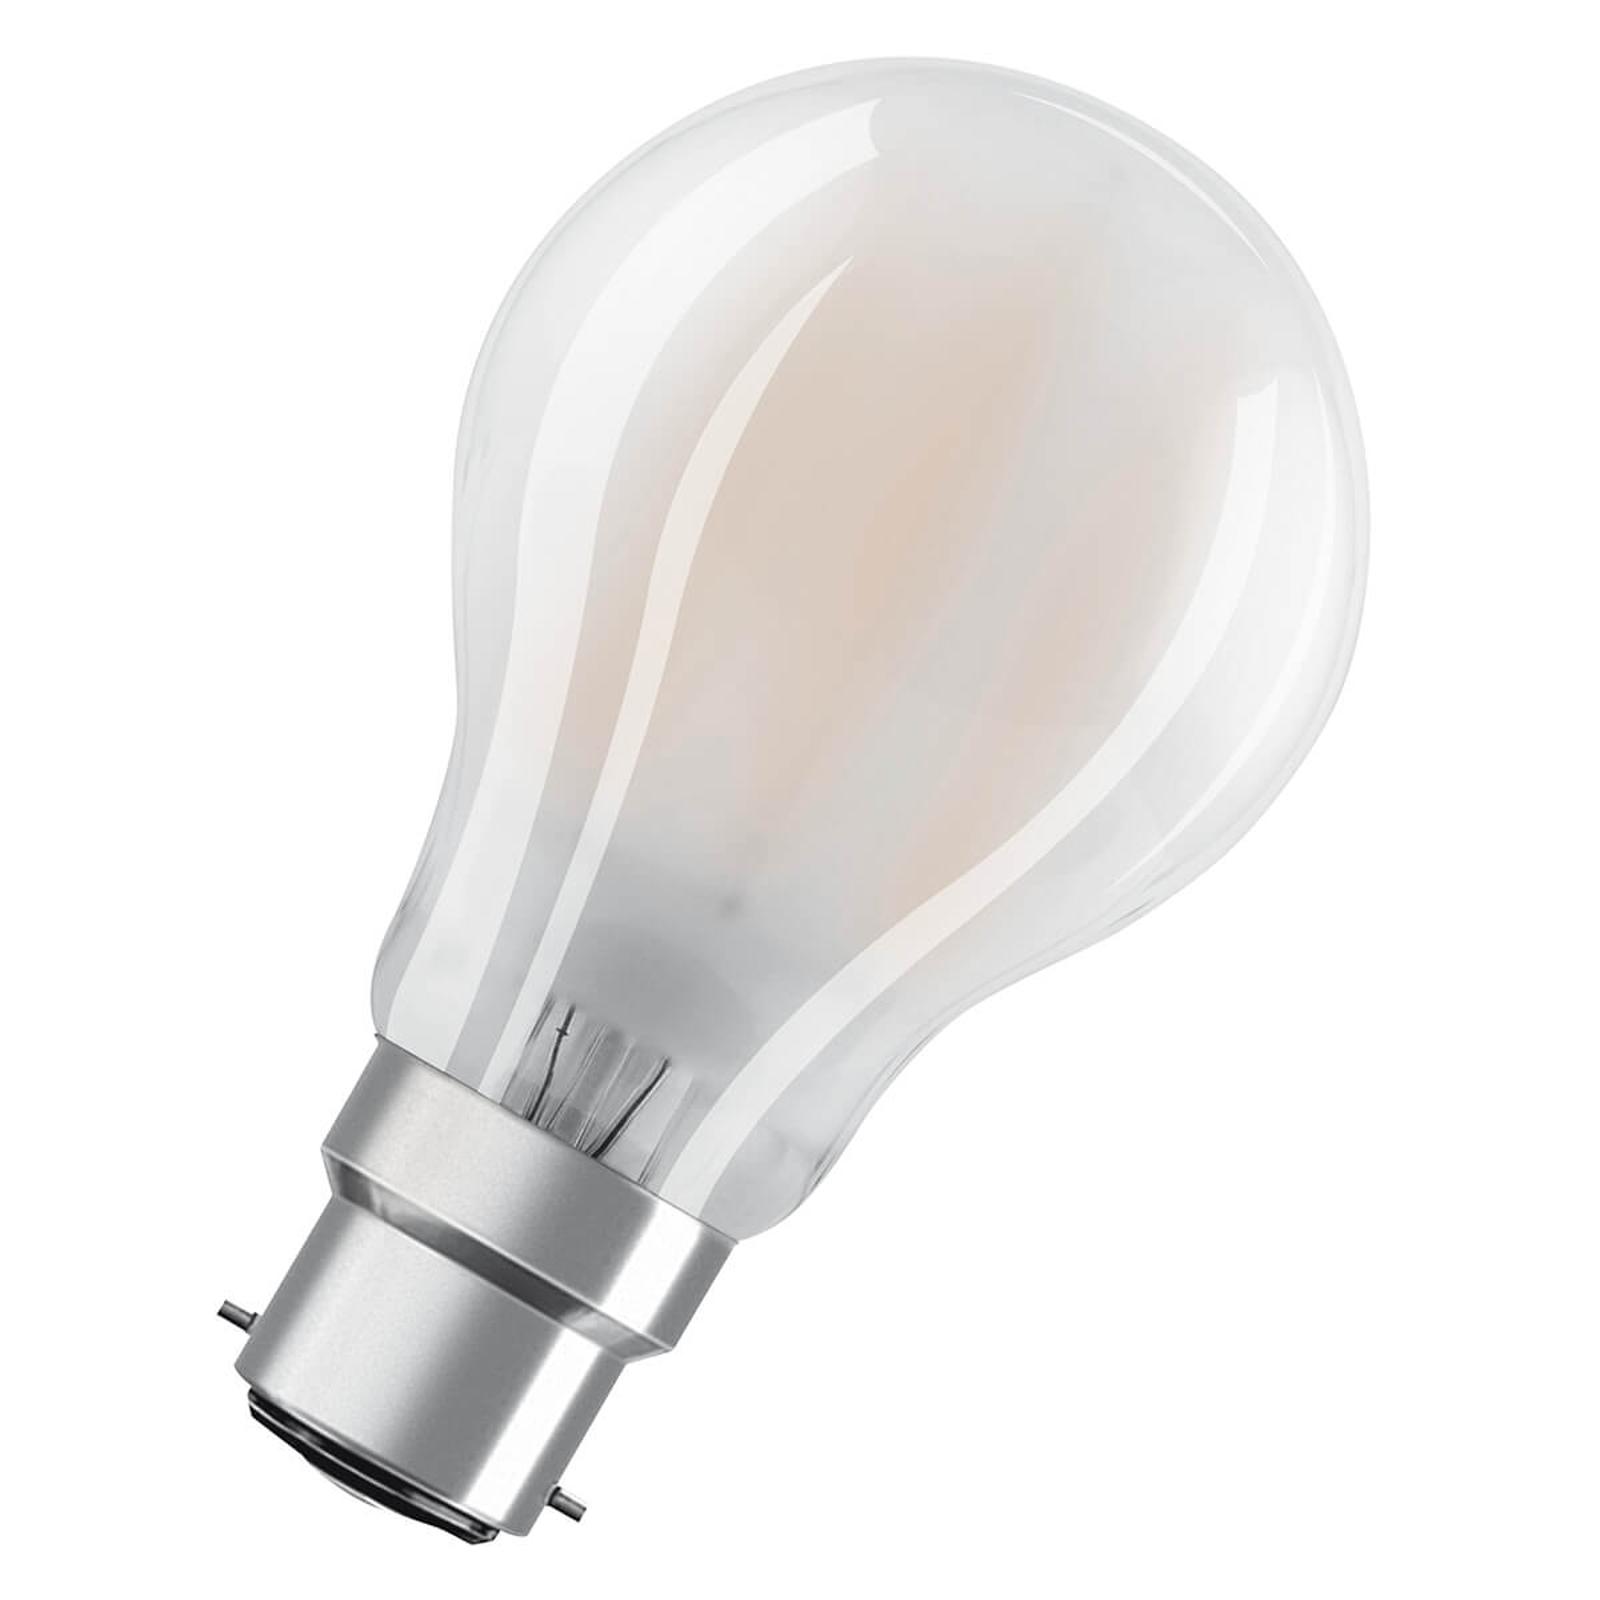 LED-Lampe B22 11W, warmweiß, 1.521 Lumen